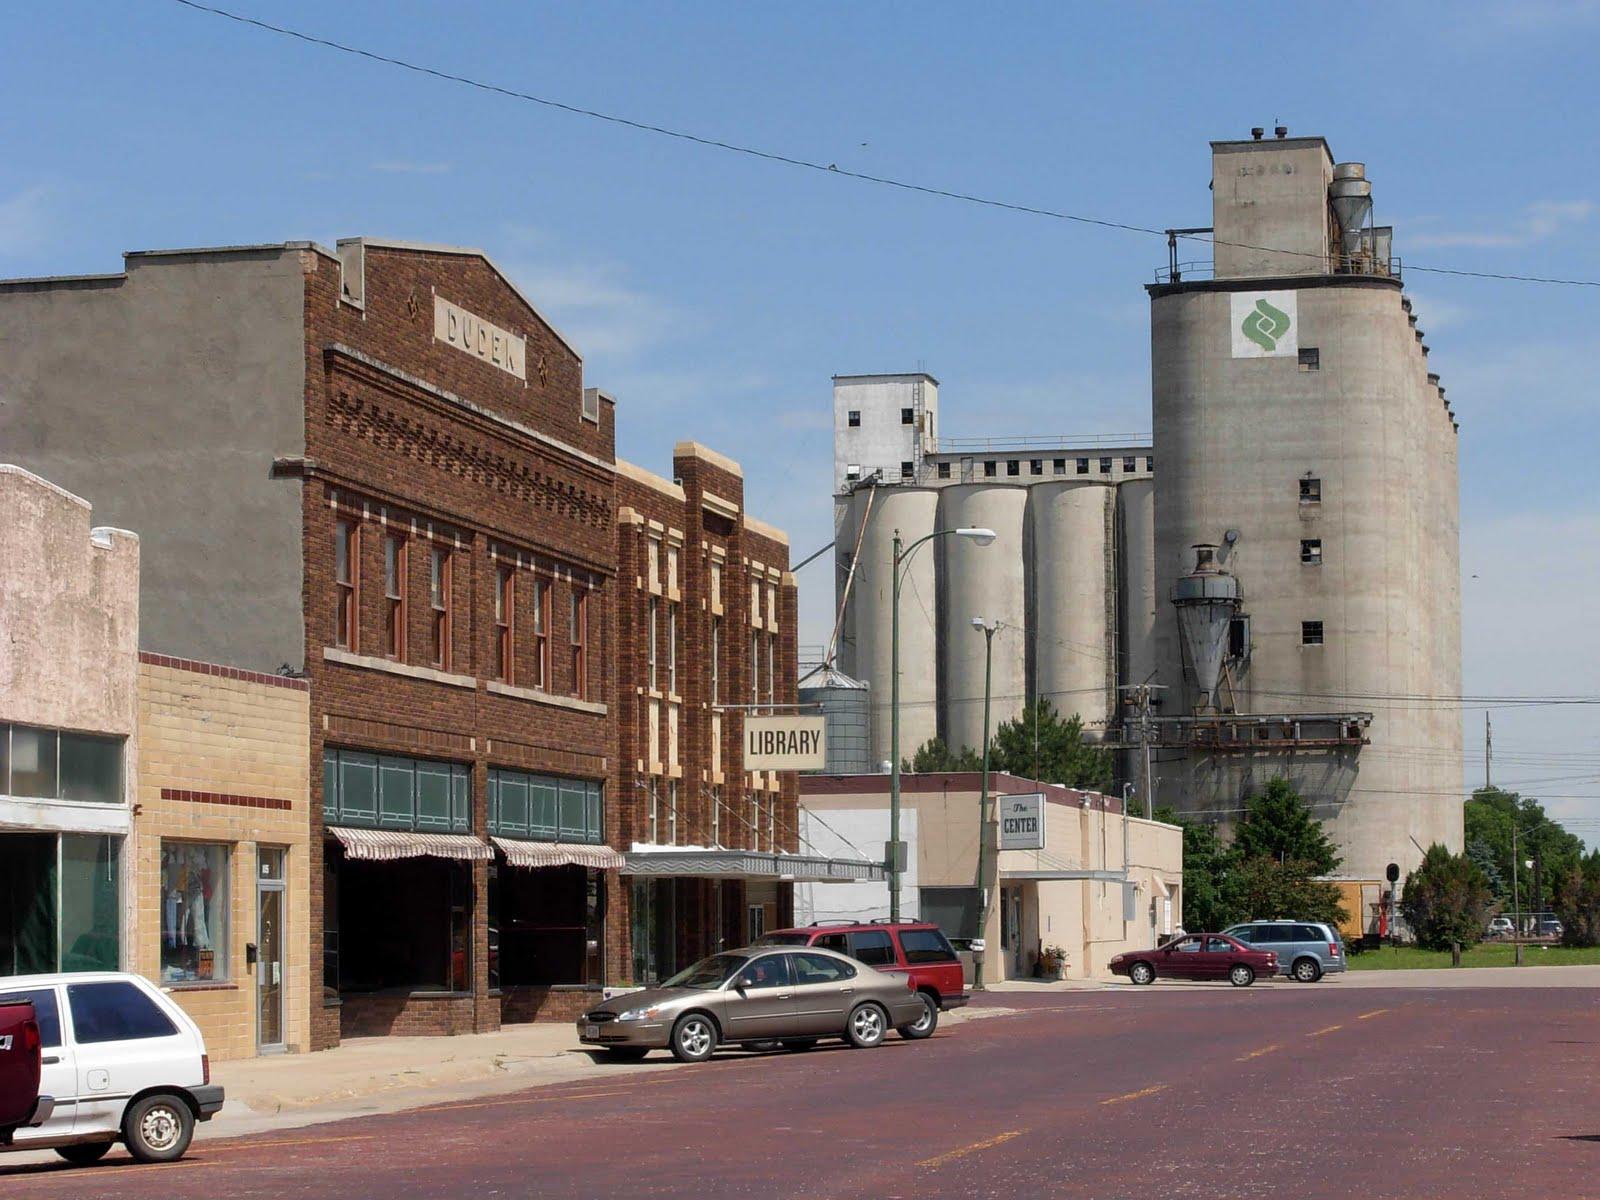 Railroad + grain silos + townschuyler town